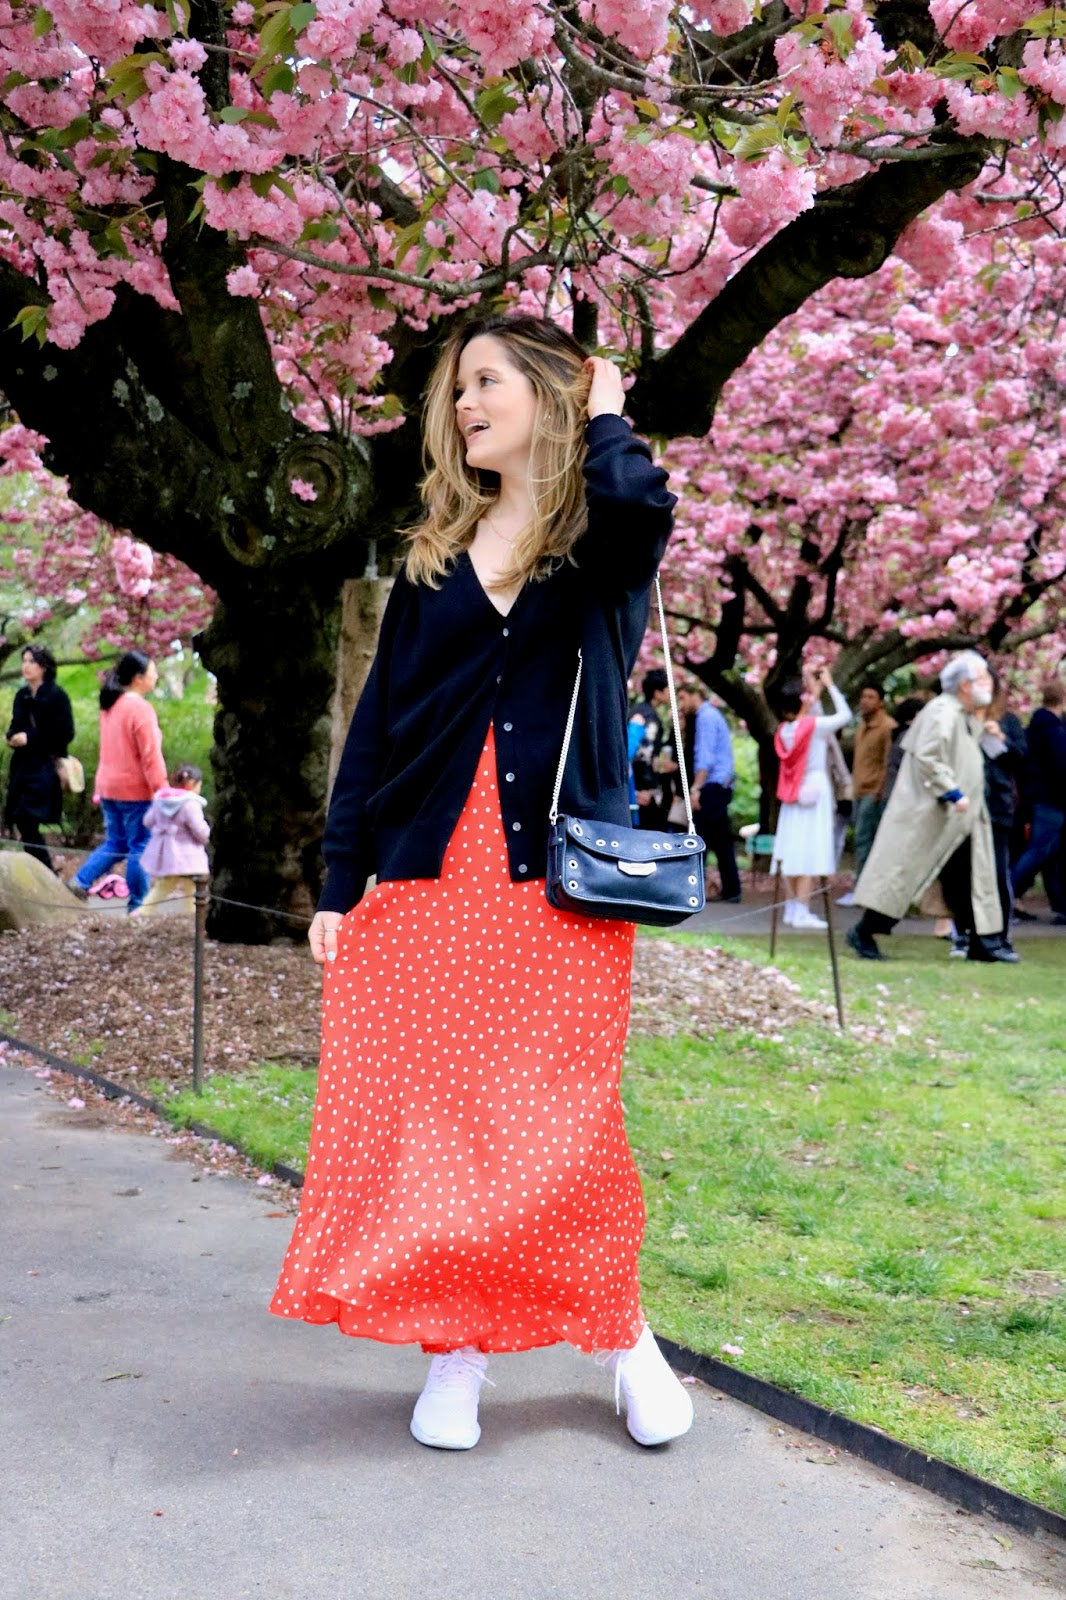 Nyc fashion blogger Kathleen Harper's spring 2019 cherry blossom pics